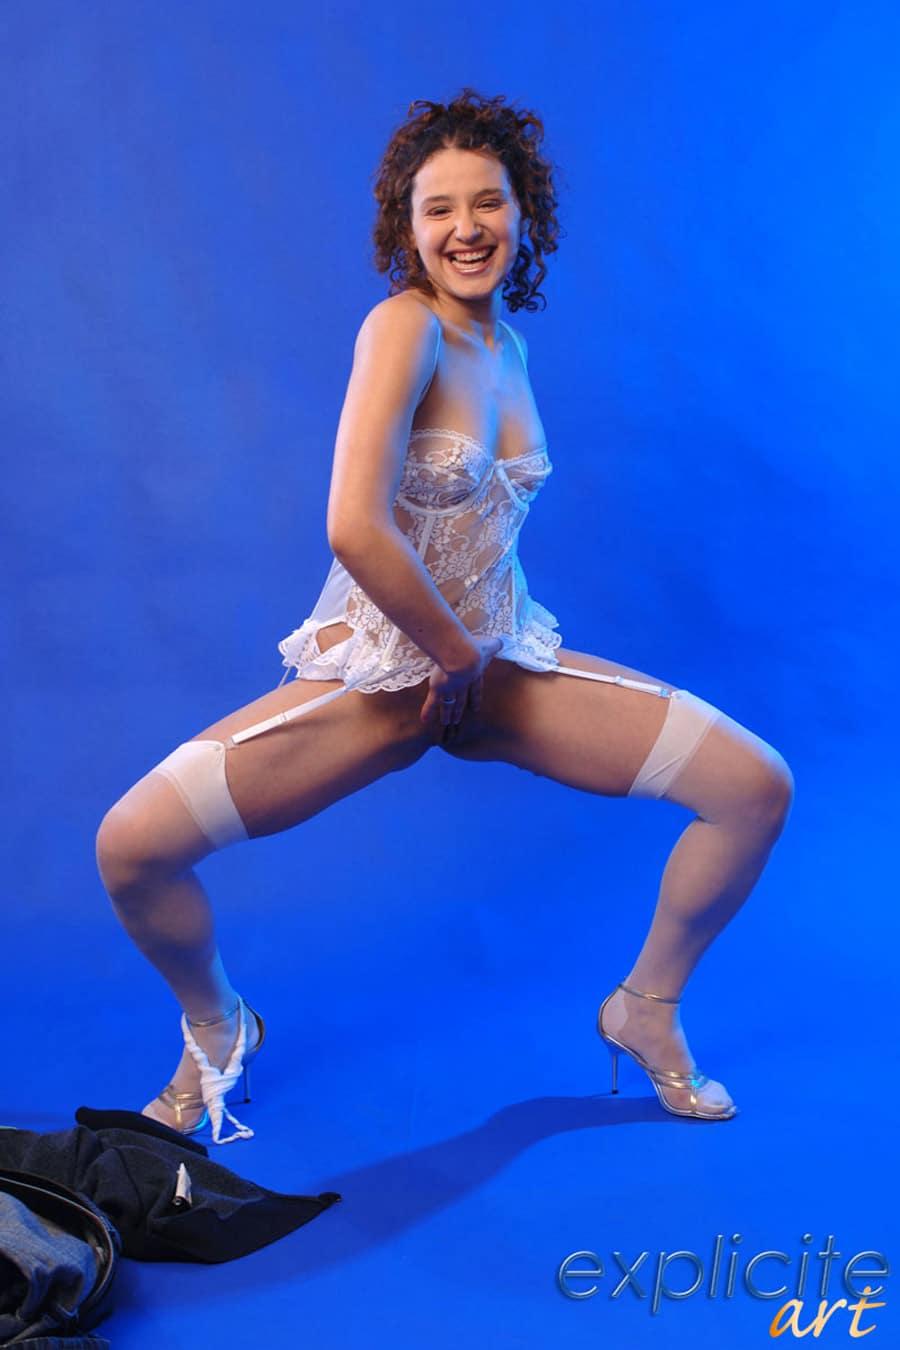 roxanne-babe-algerienne-striptease-expliciteart-12